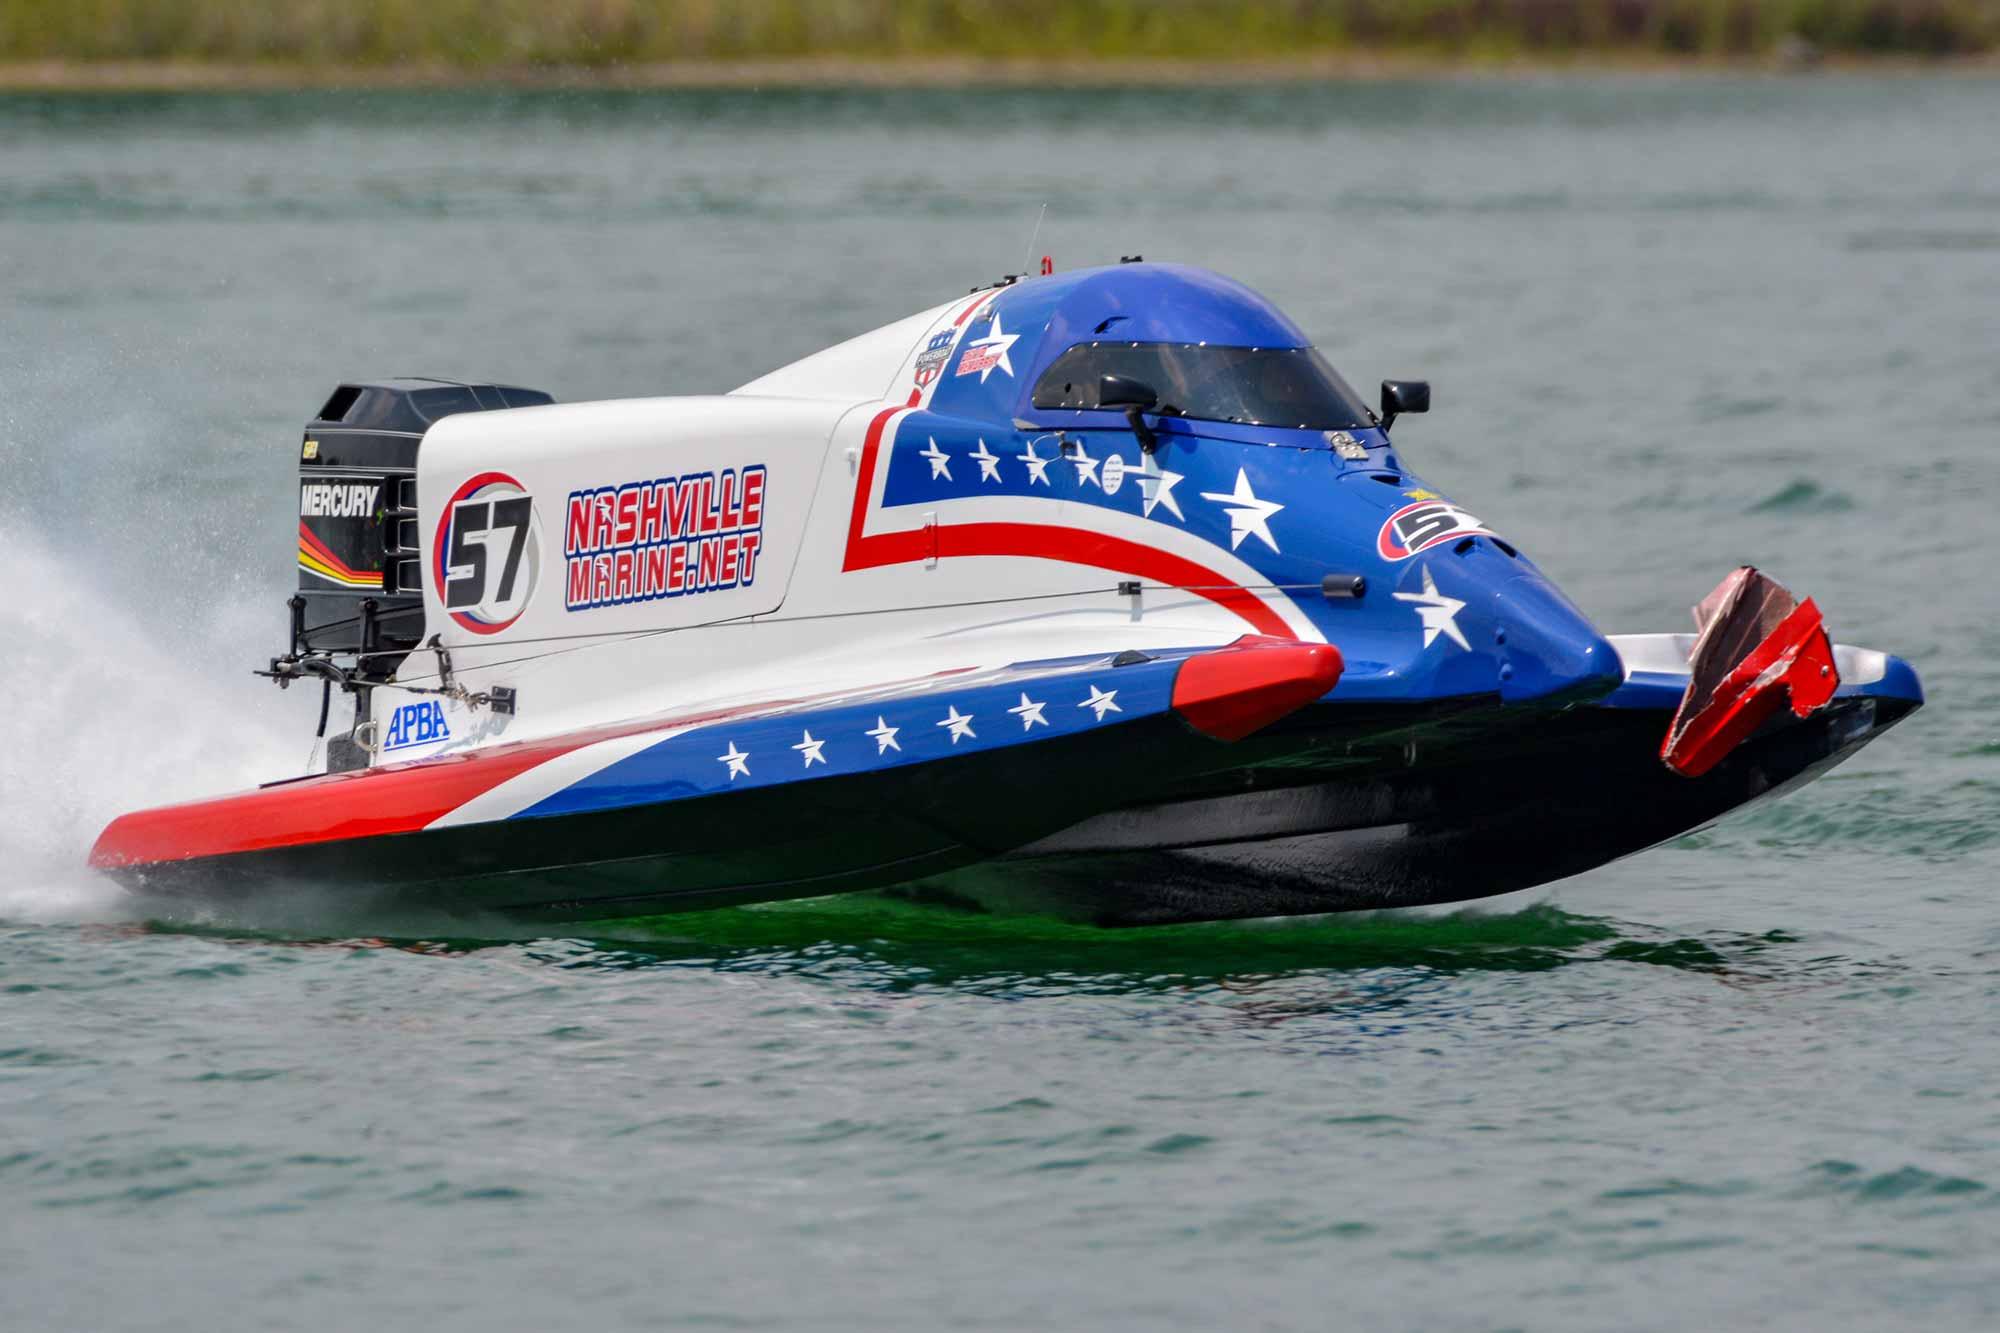 McMurray-Racing-Nashvill-Marine-2021-Springfield-F1-Race-9